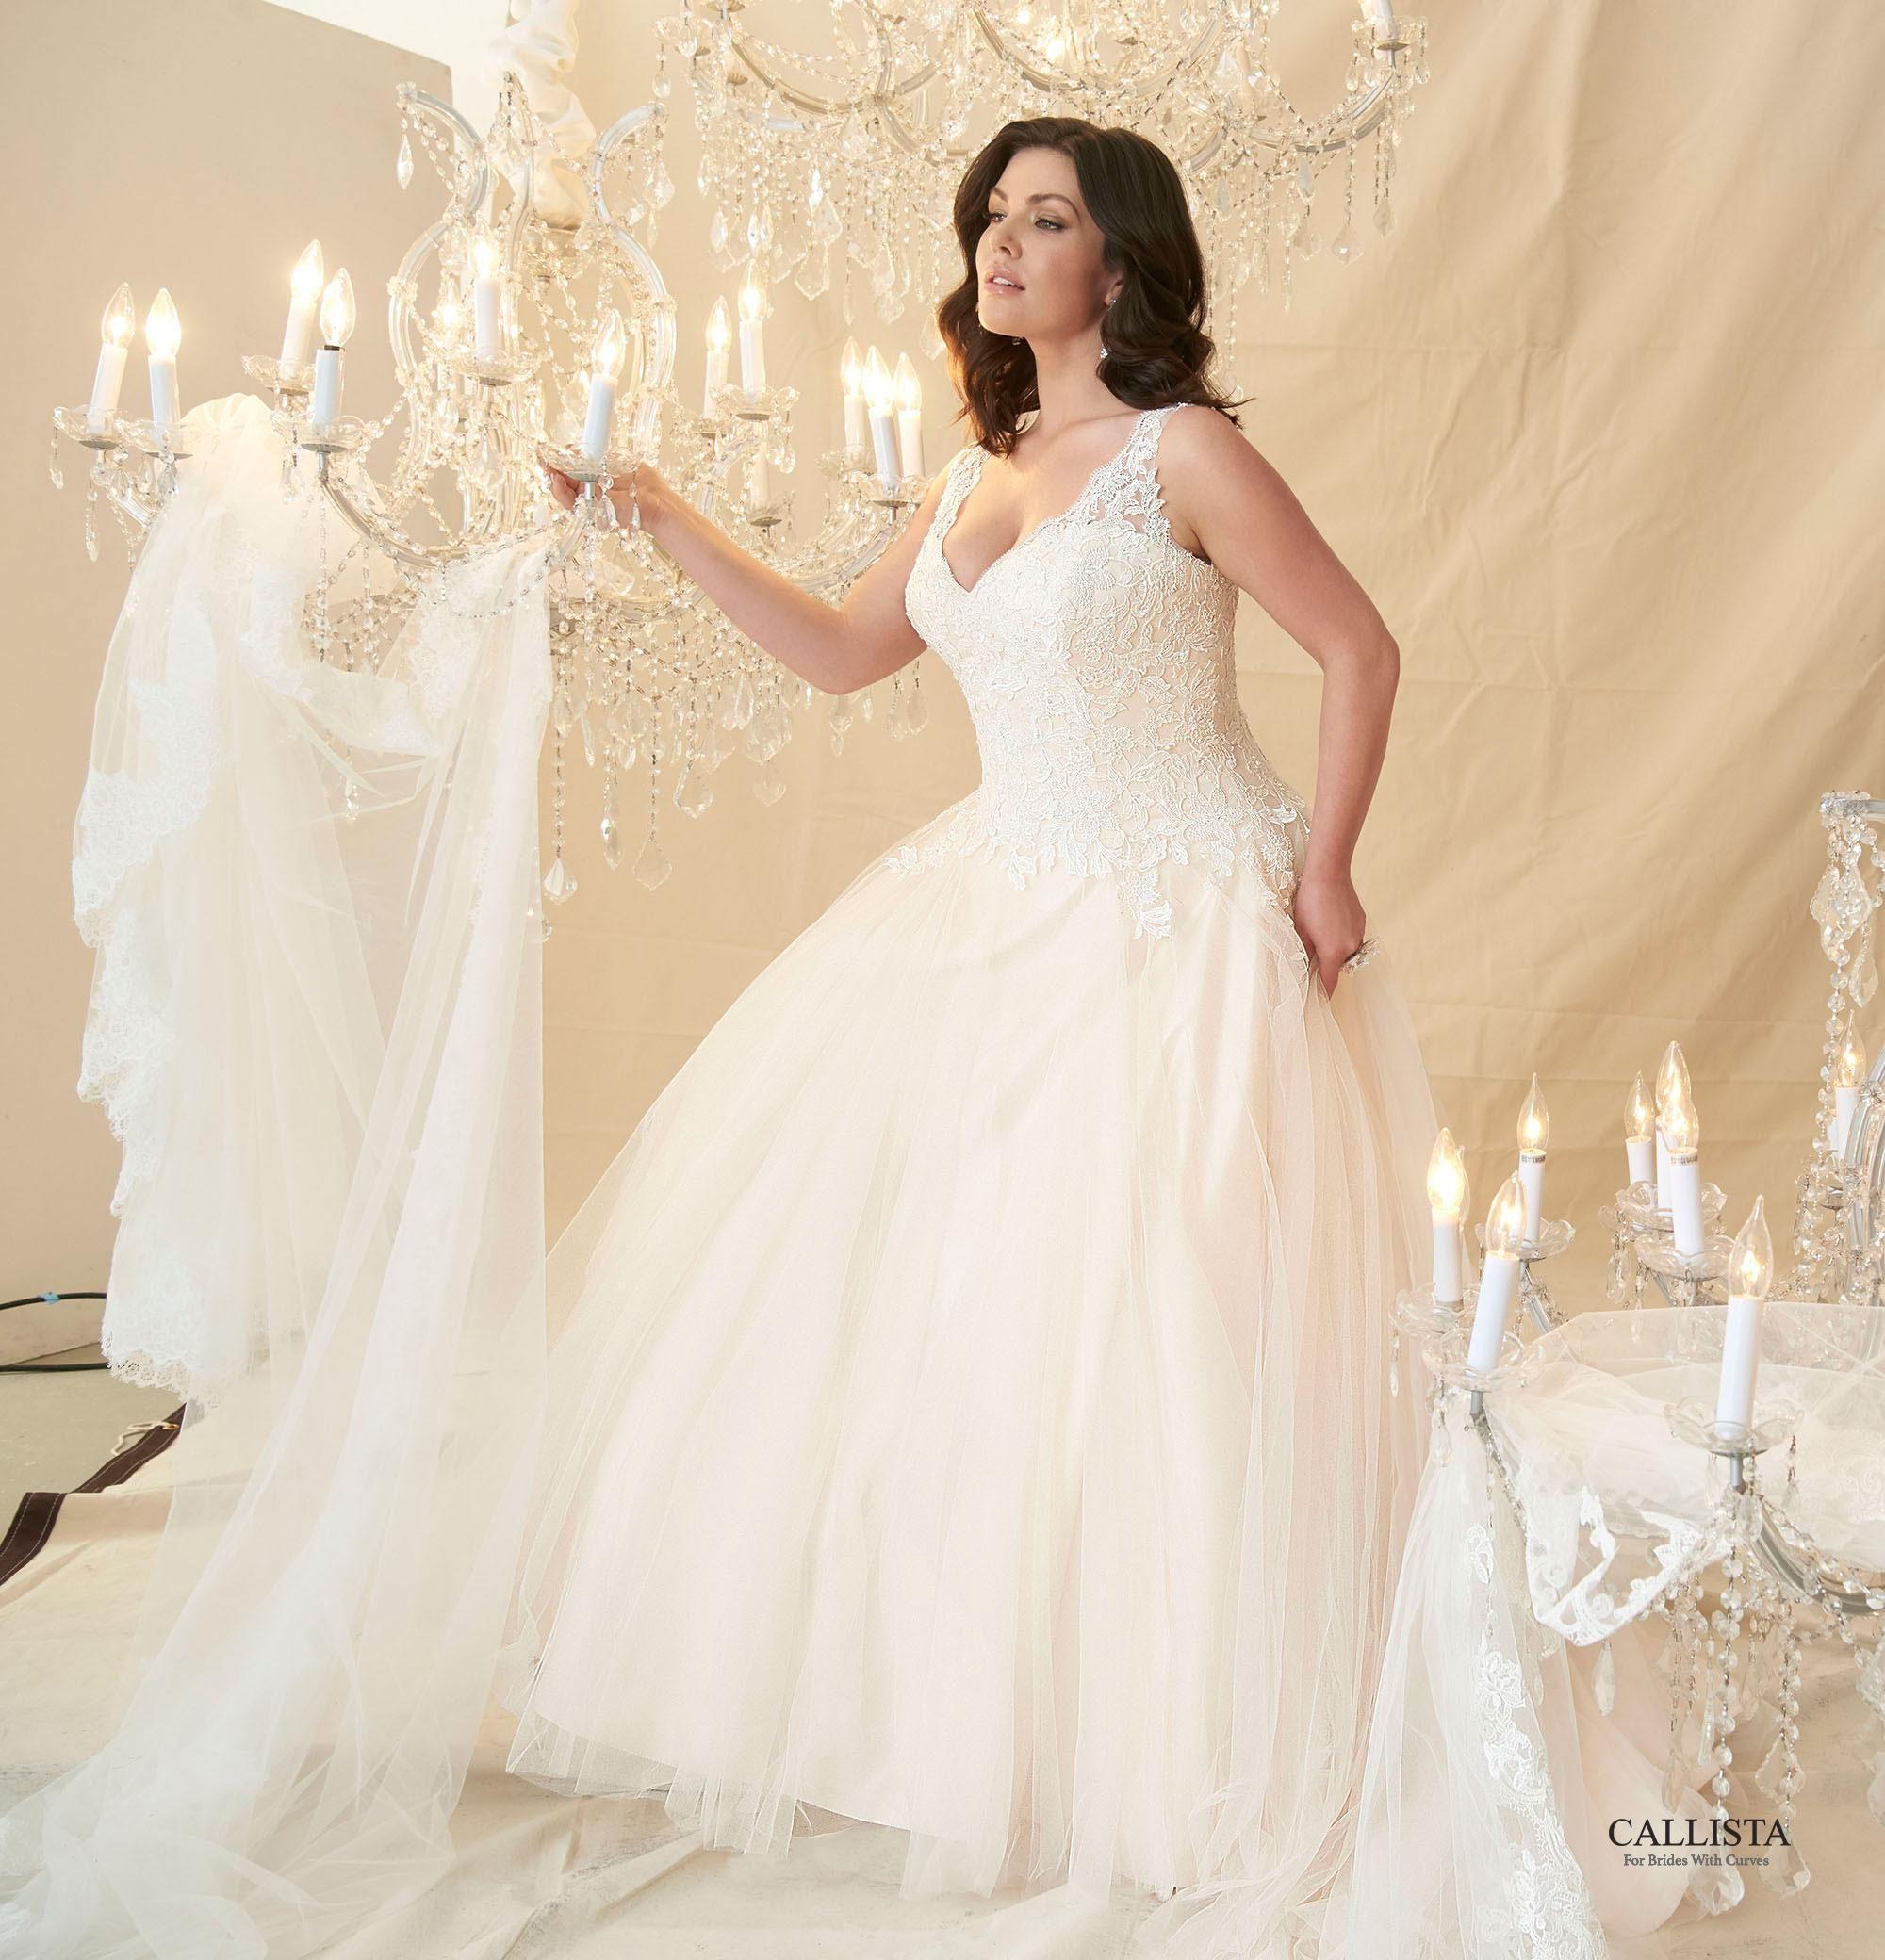 Cezanne | Callista Plus Size Wedding Dresses: Prinzessin & Ball Gown ...